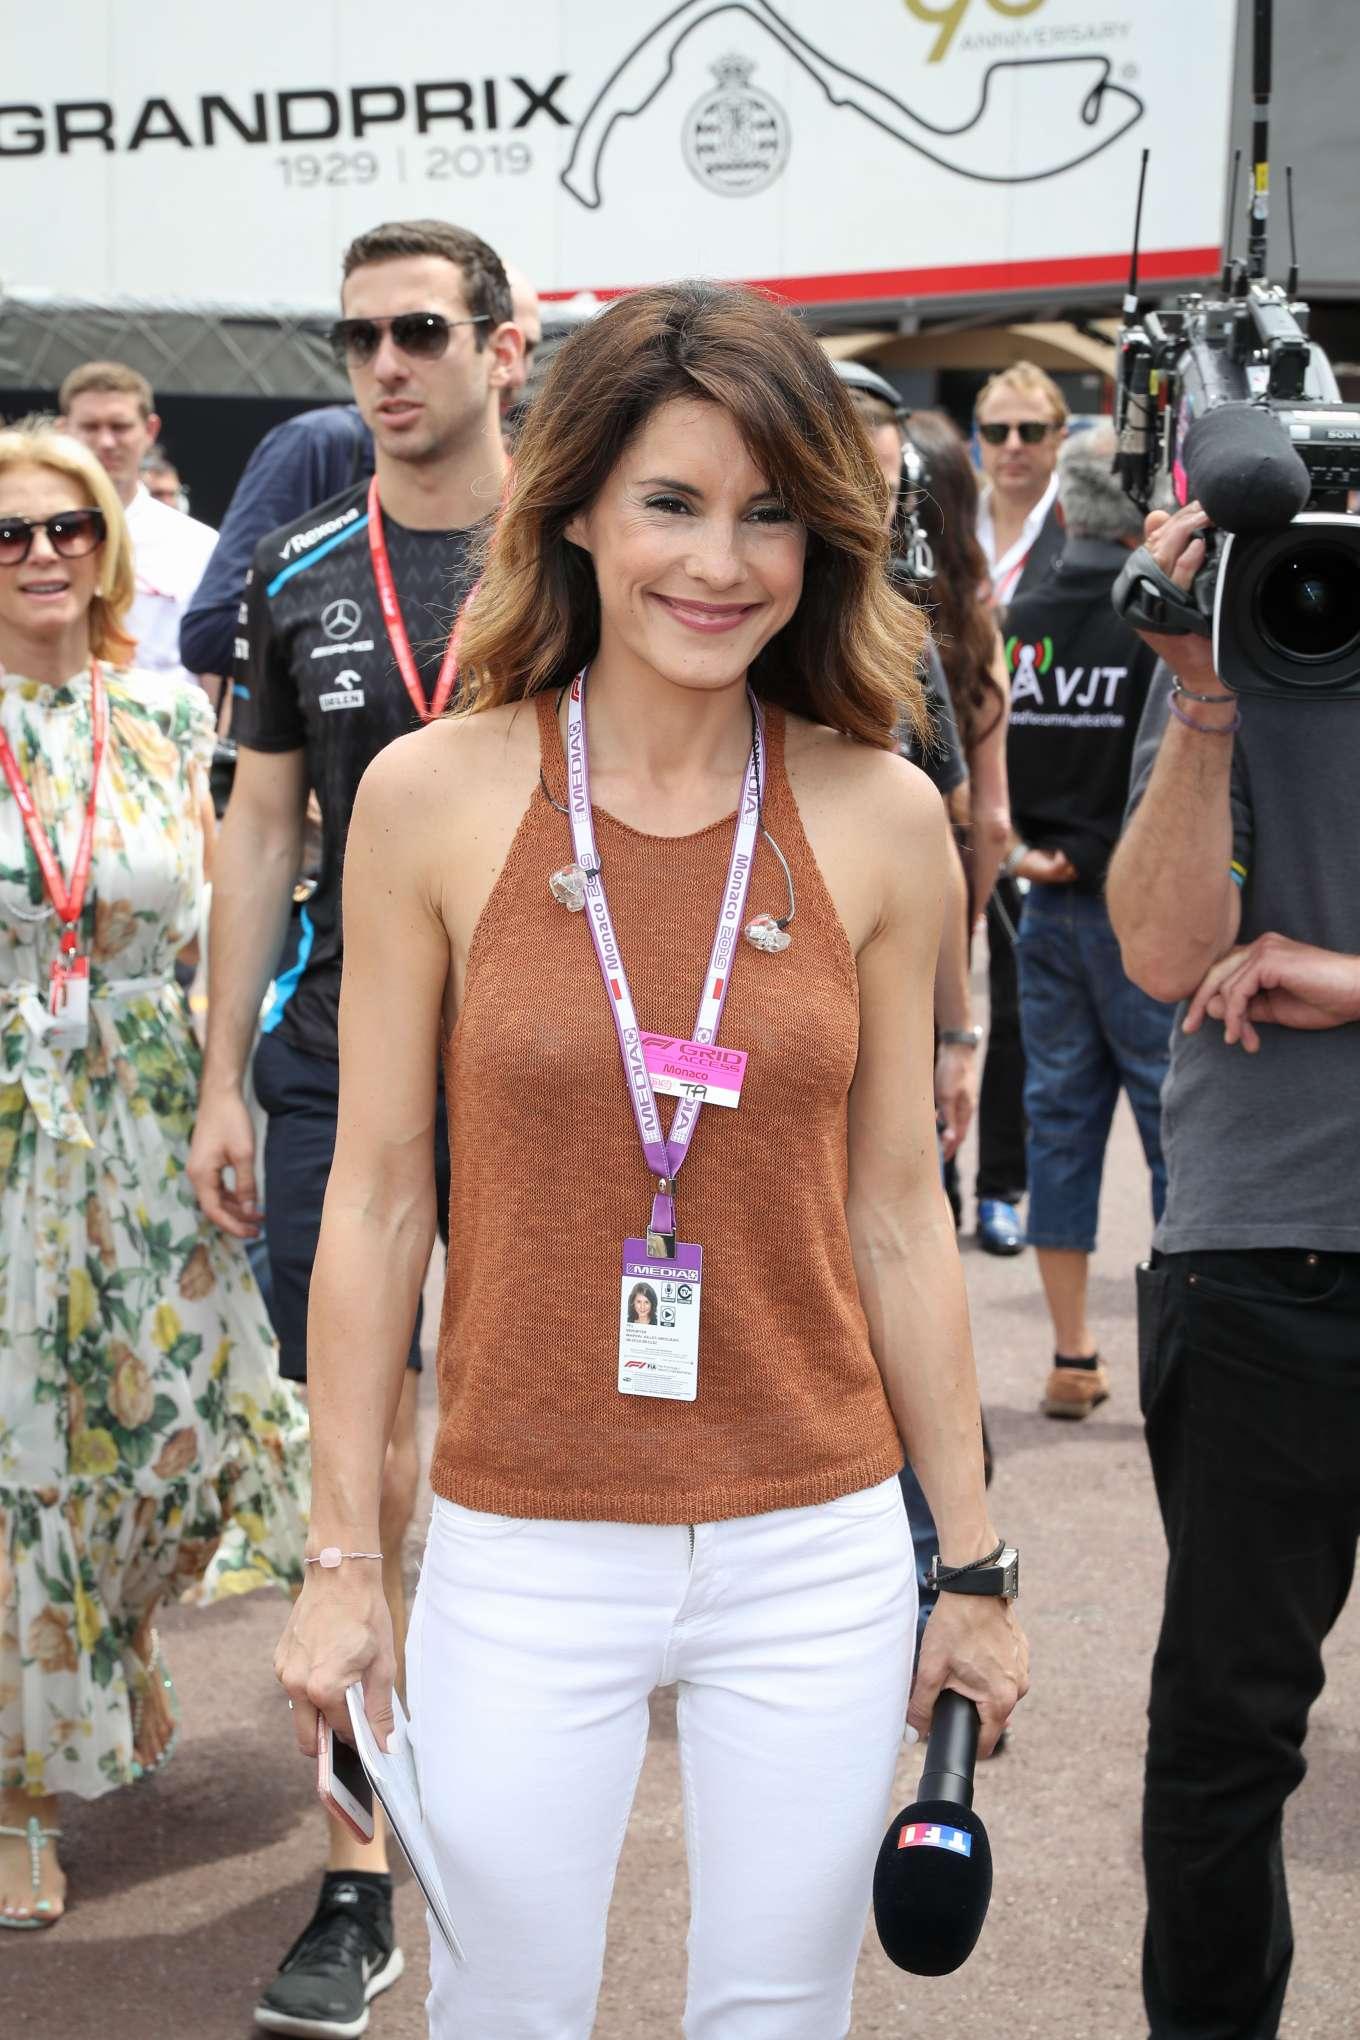 Marion-Jolles-Grosjean:-77th-Formula-1-G